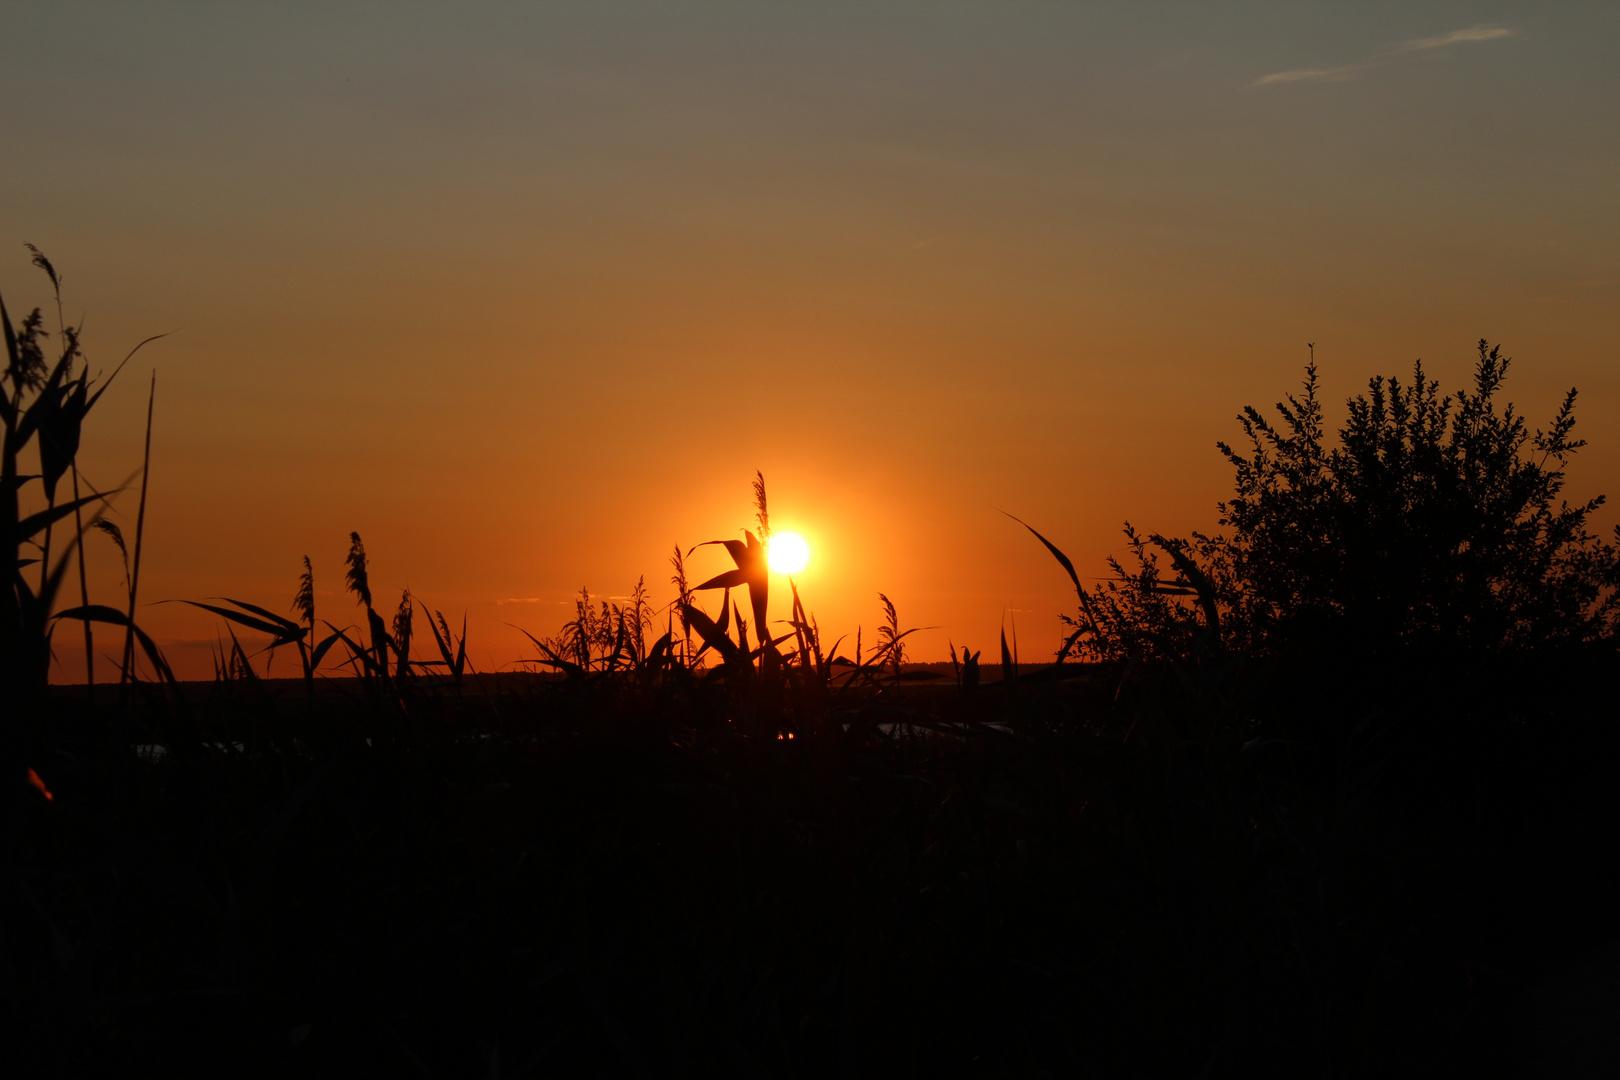 Sonnenuntergang Bodstedter Bodden Bresewitz